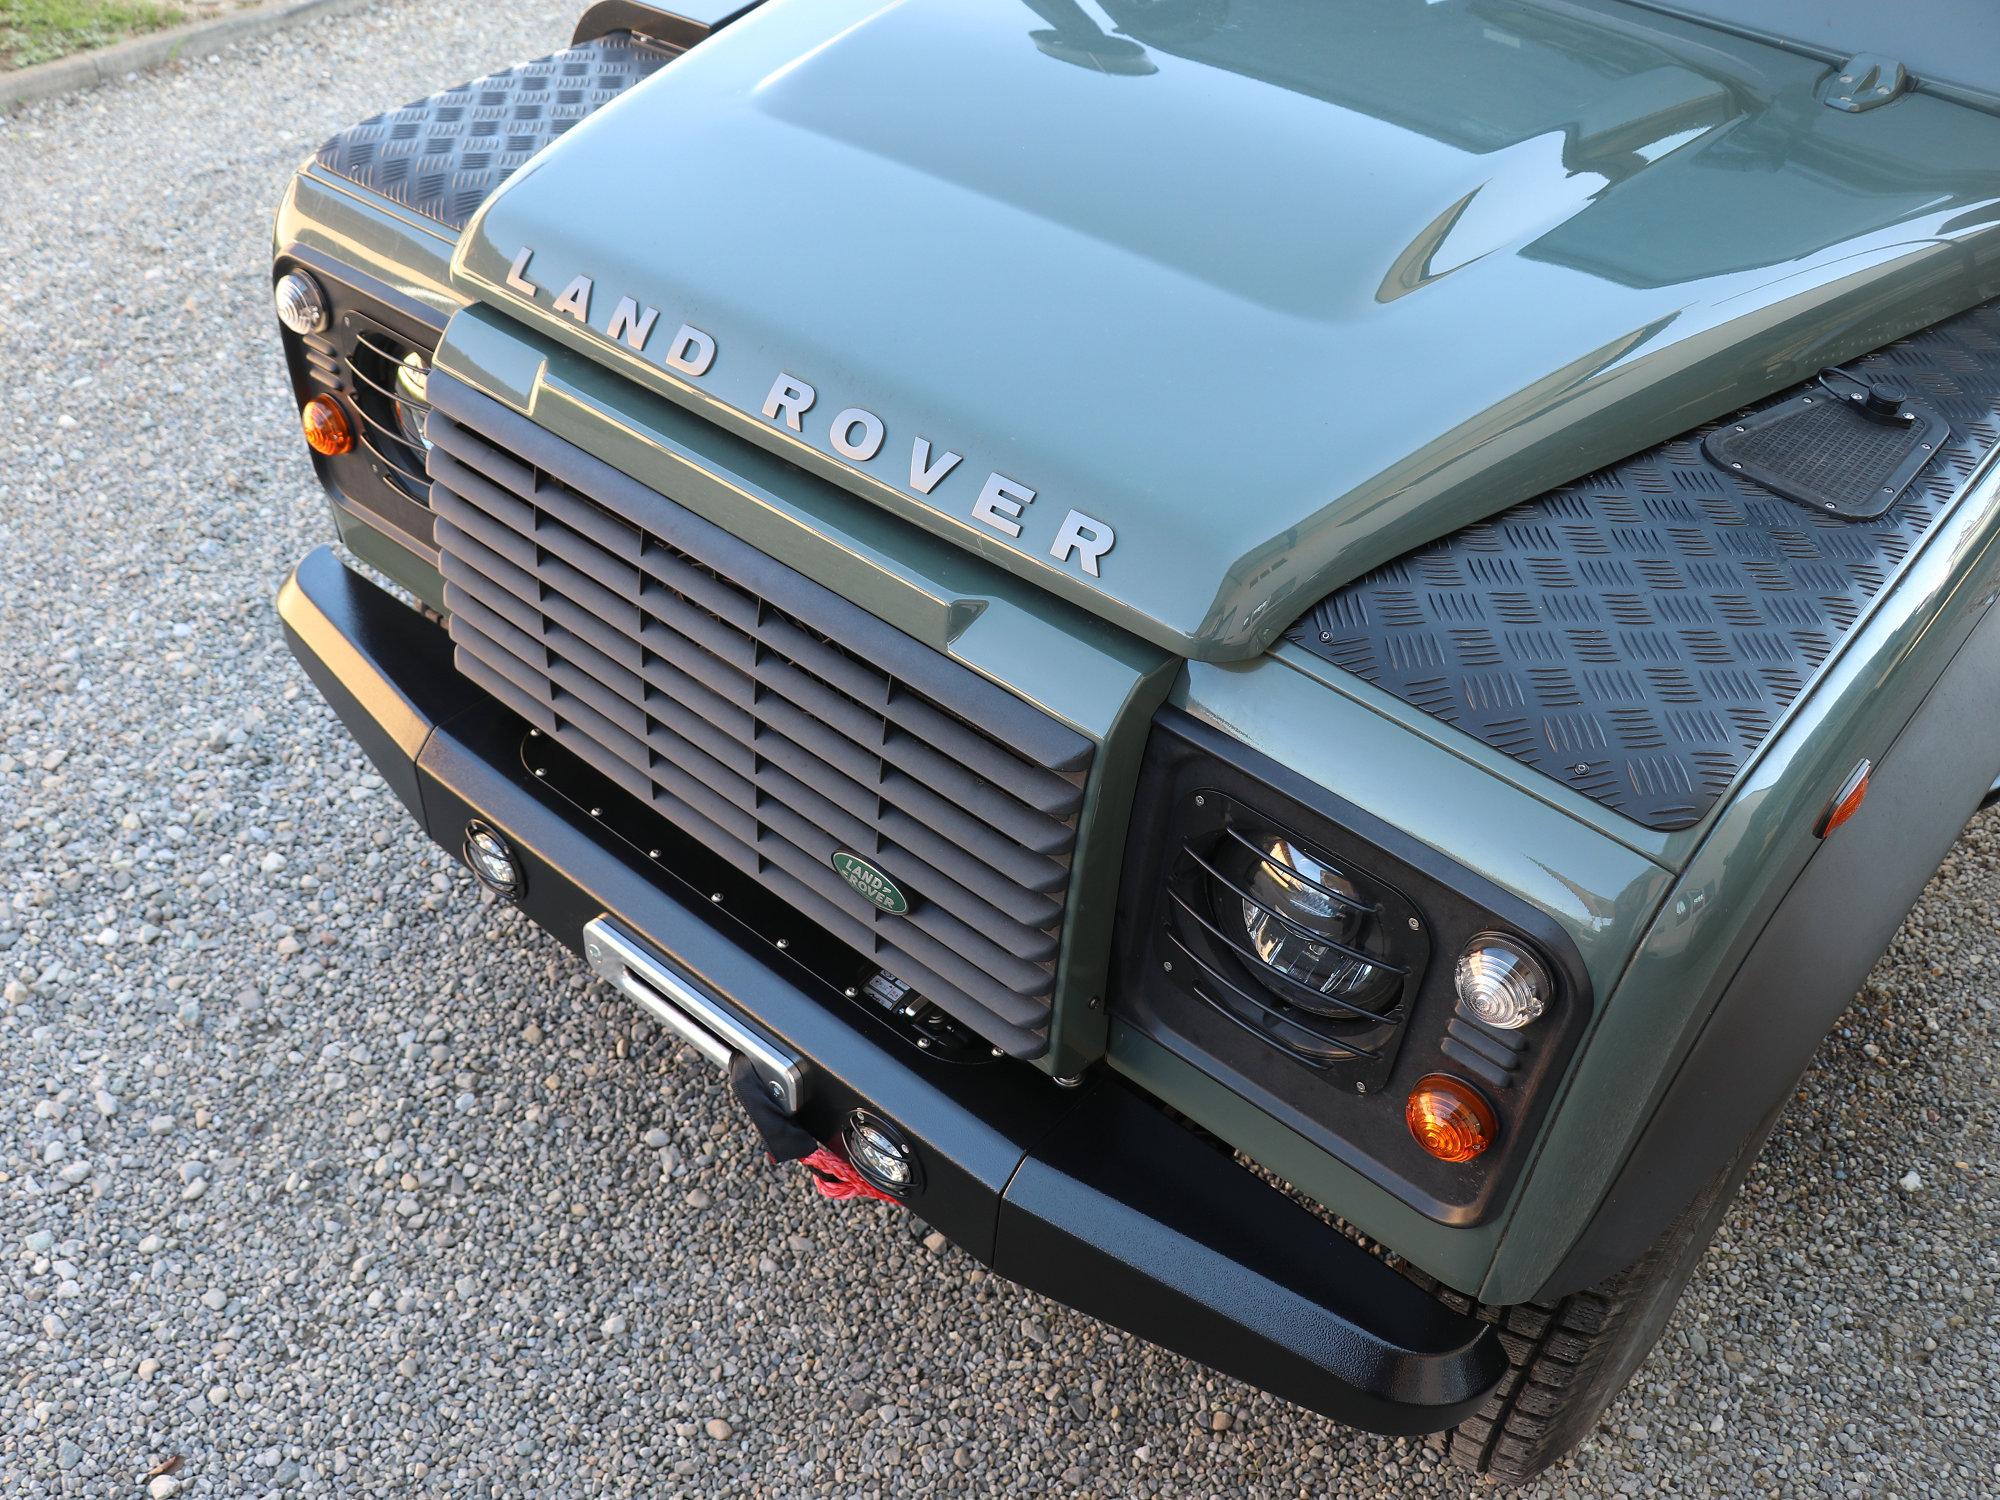 Seilwindenstossstange Land Rover Defender.001